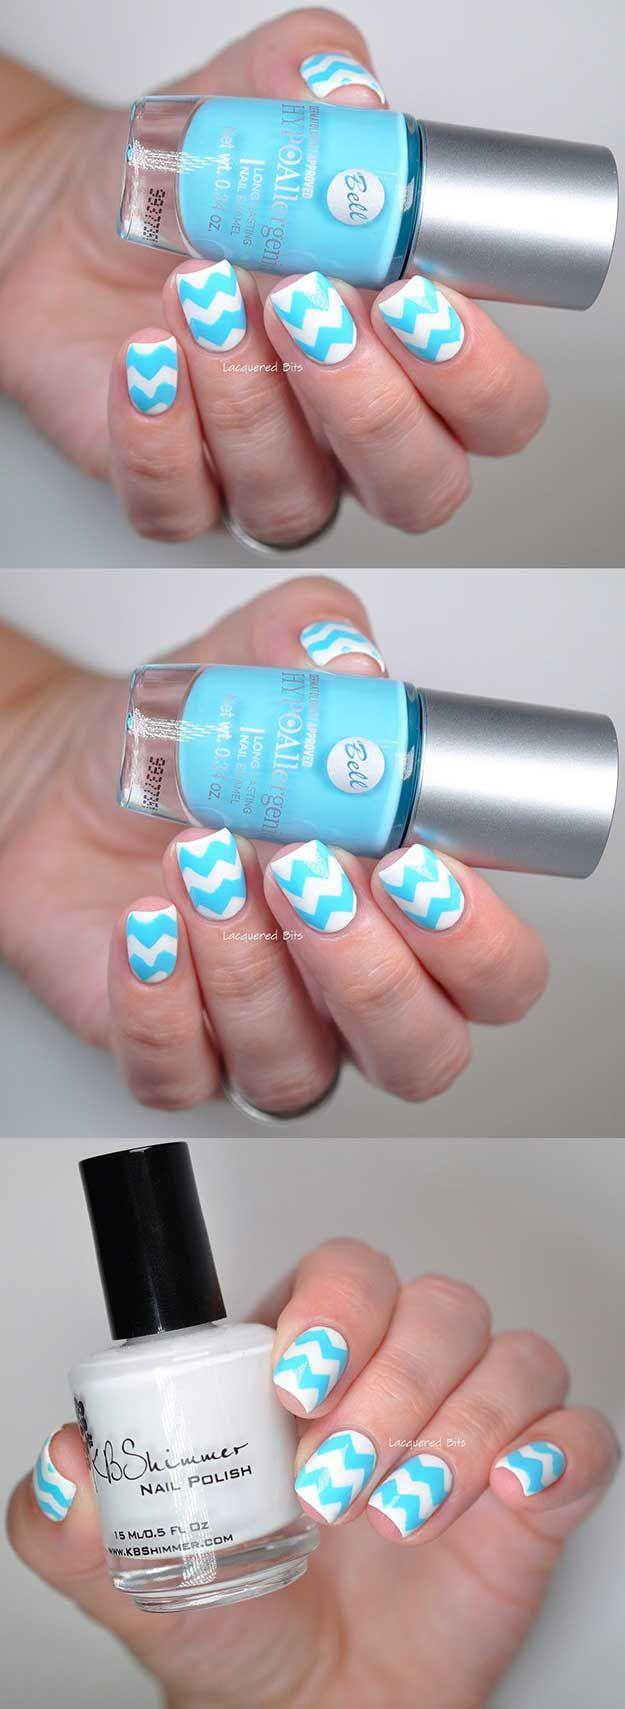 37 Chevron Nail Art Ideas | Pinterest | Chevron nail art, Chevron ...